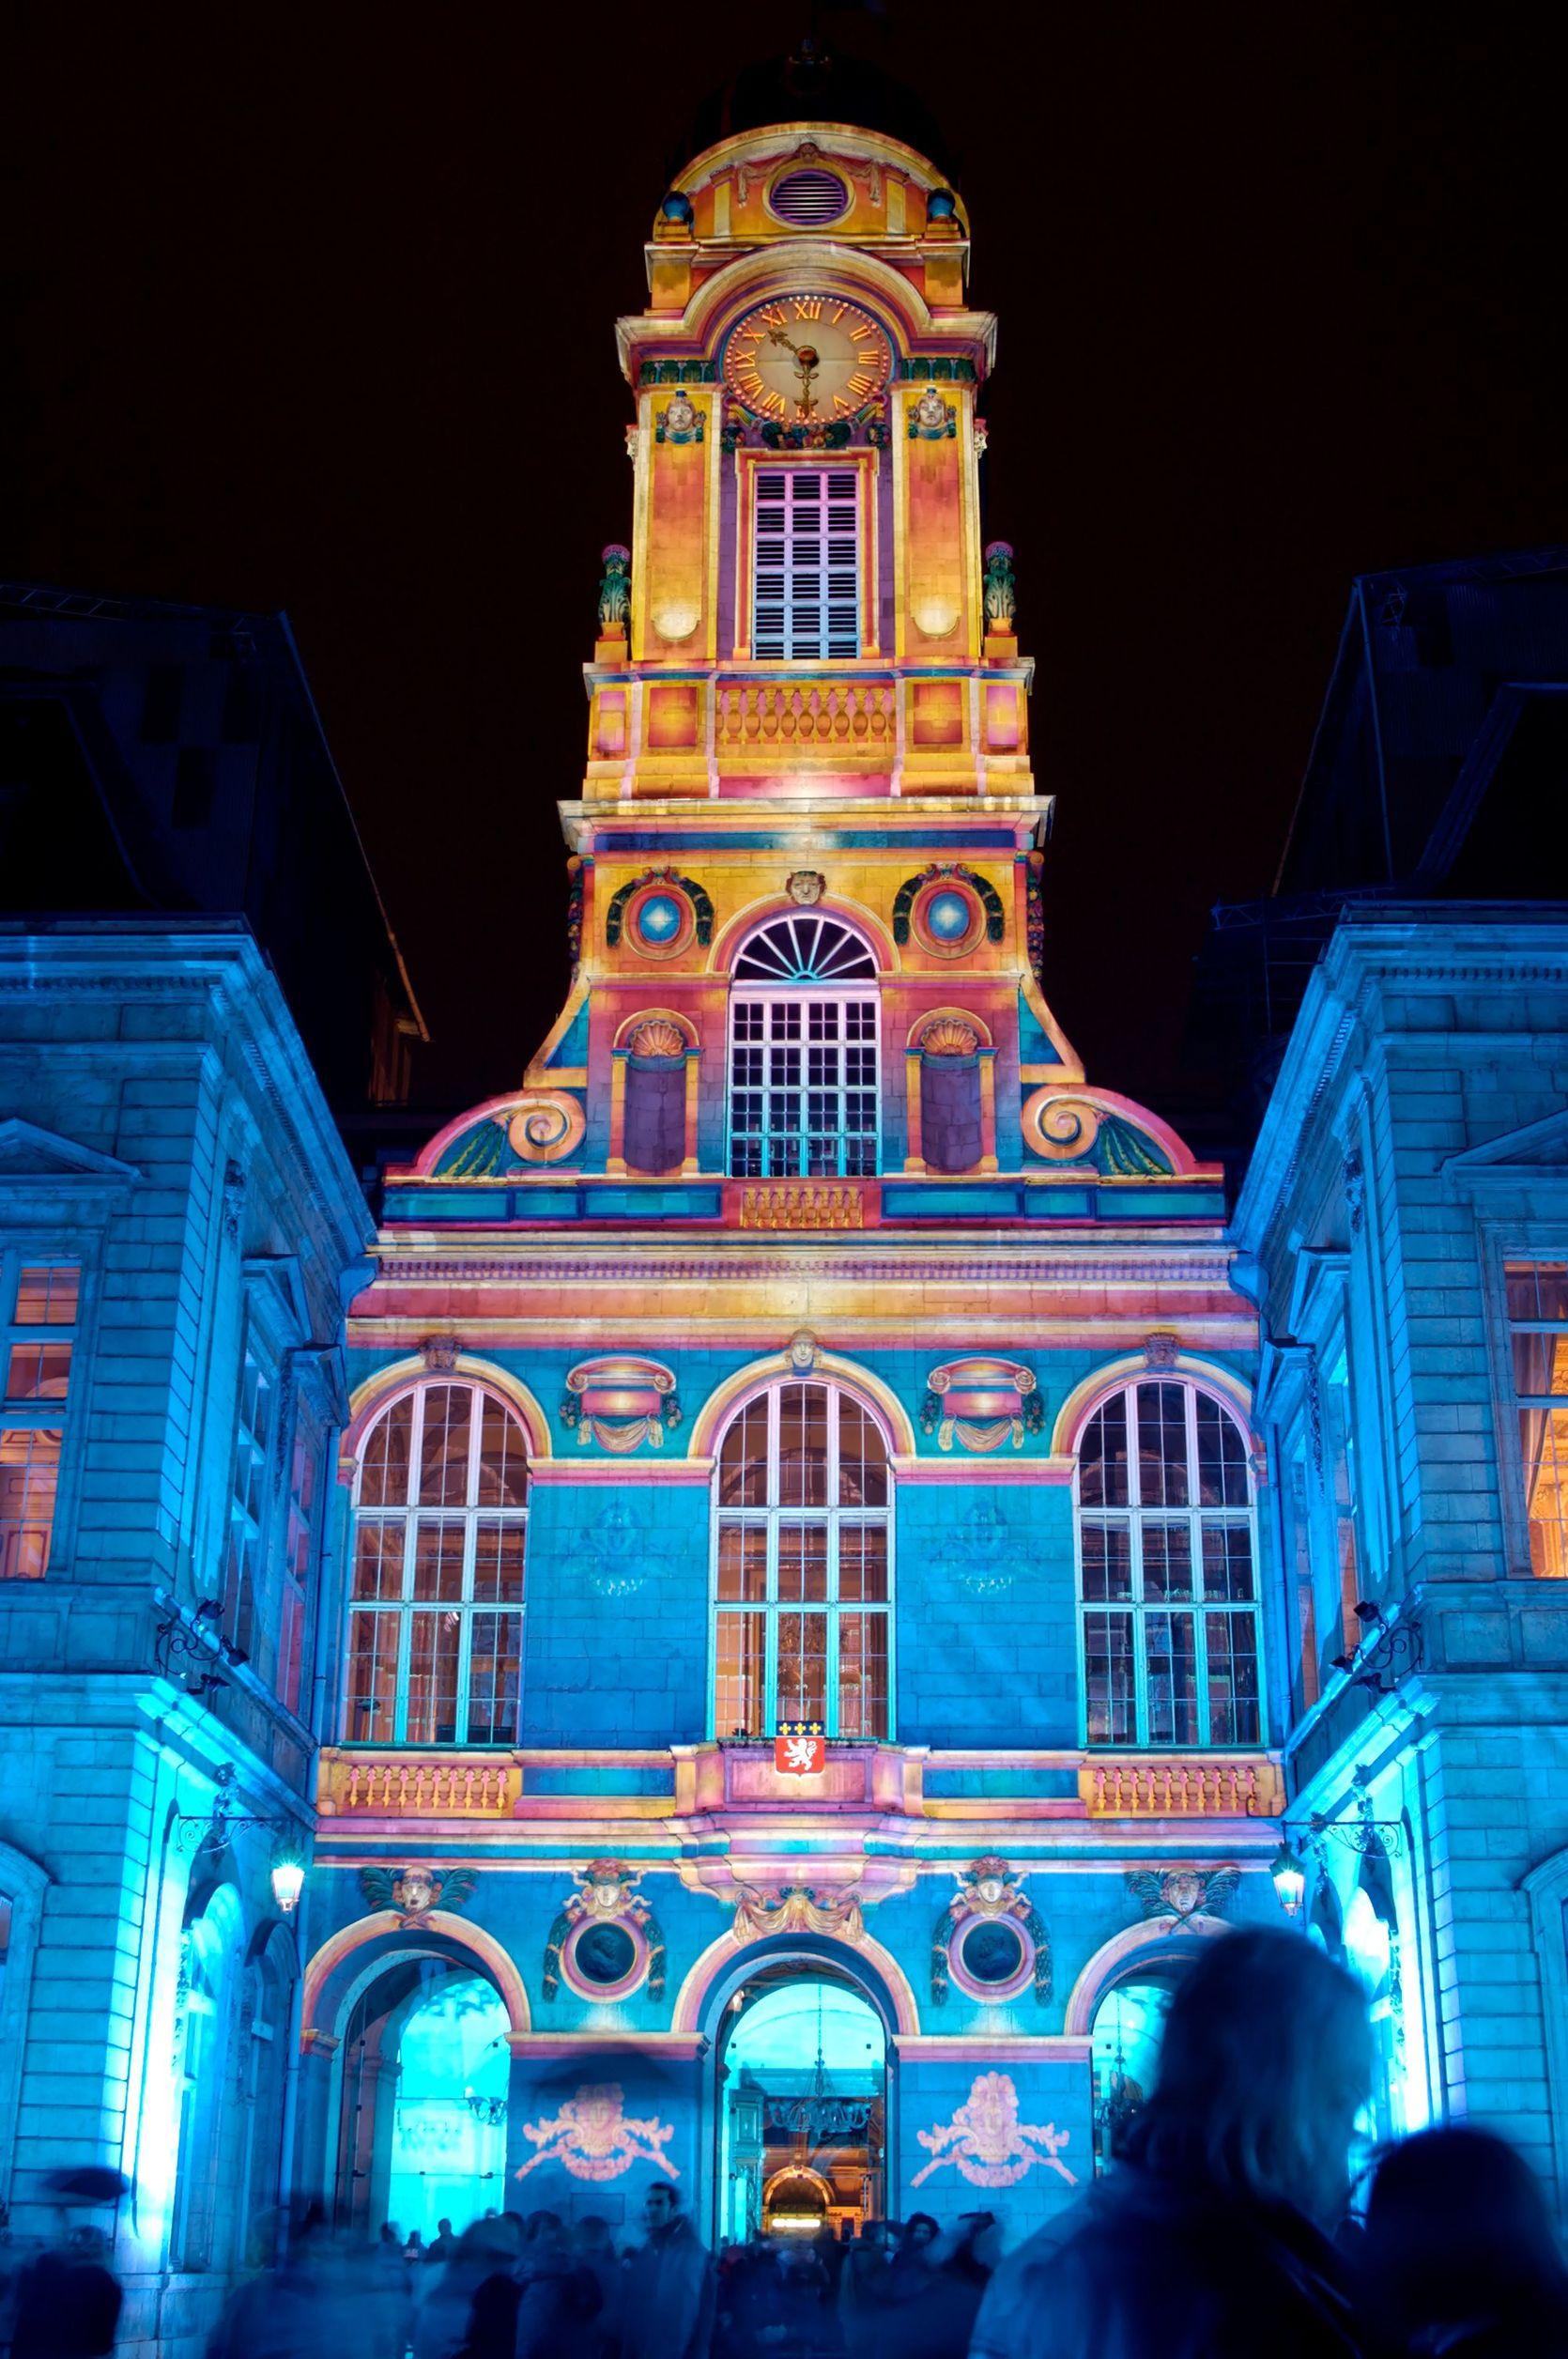 Lyon Festival Of Light - blue clock